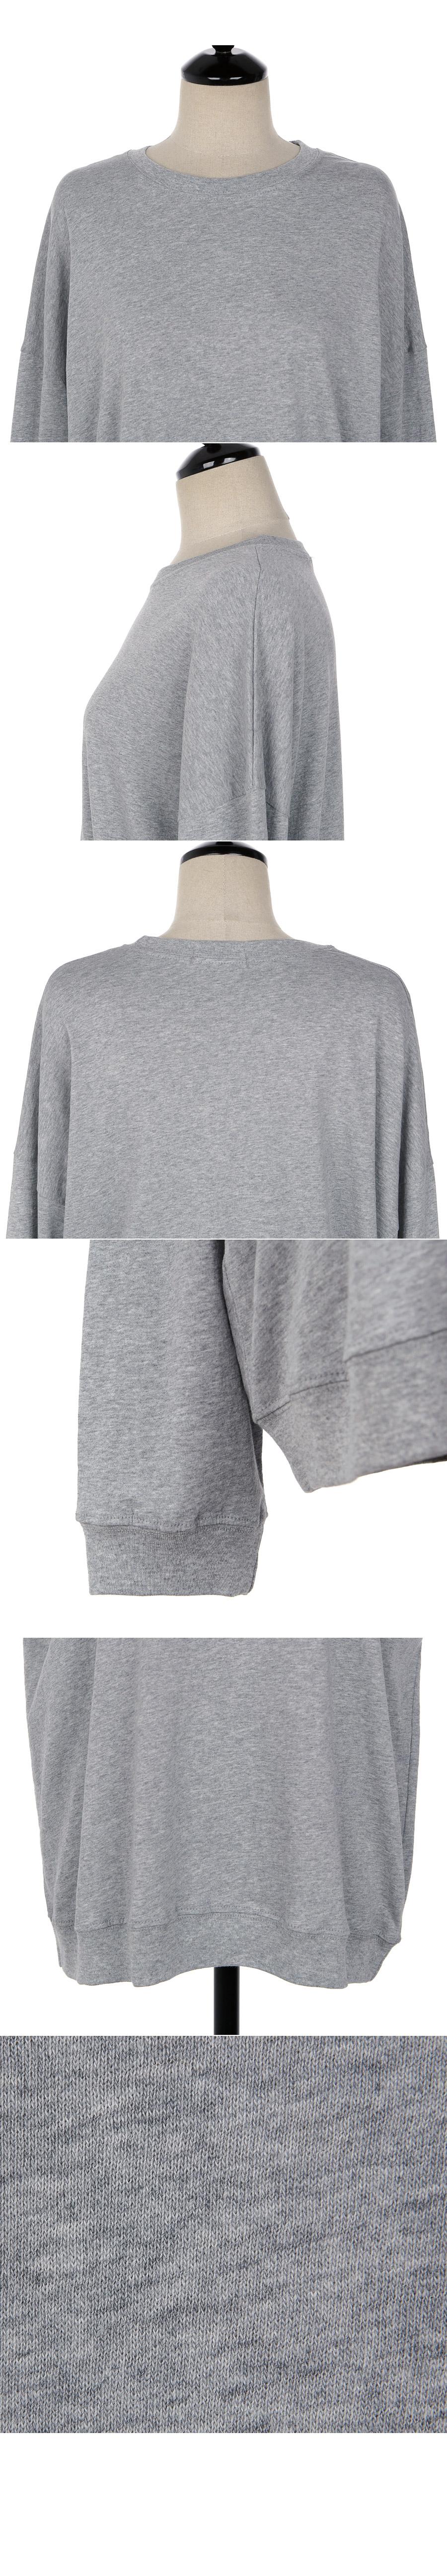 Pro mtm gray